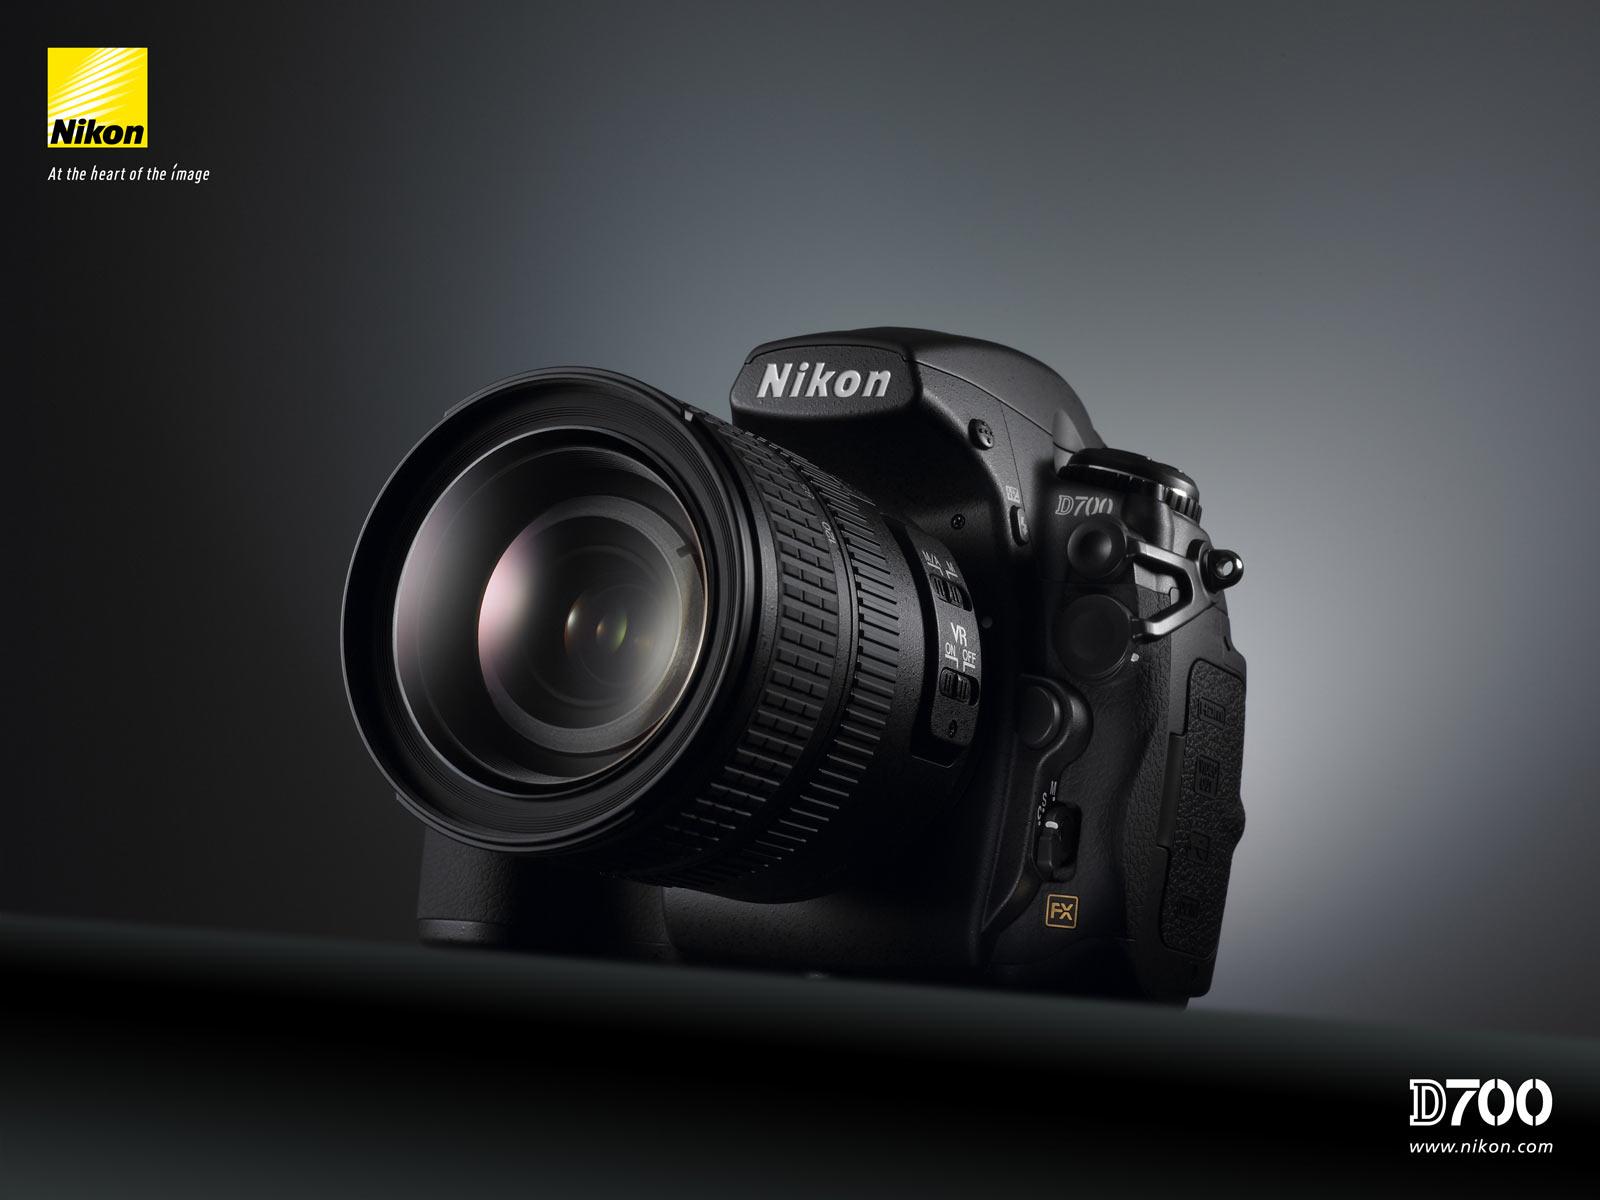 http://1.bp.blogspot.com/-EFkXXTngf68/TdAKGaZ_nzI/AAAAAAAABmM/TjLWECMAZ3I/s1600/Nikon-D700-FX-wallpapers.jpg